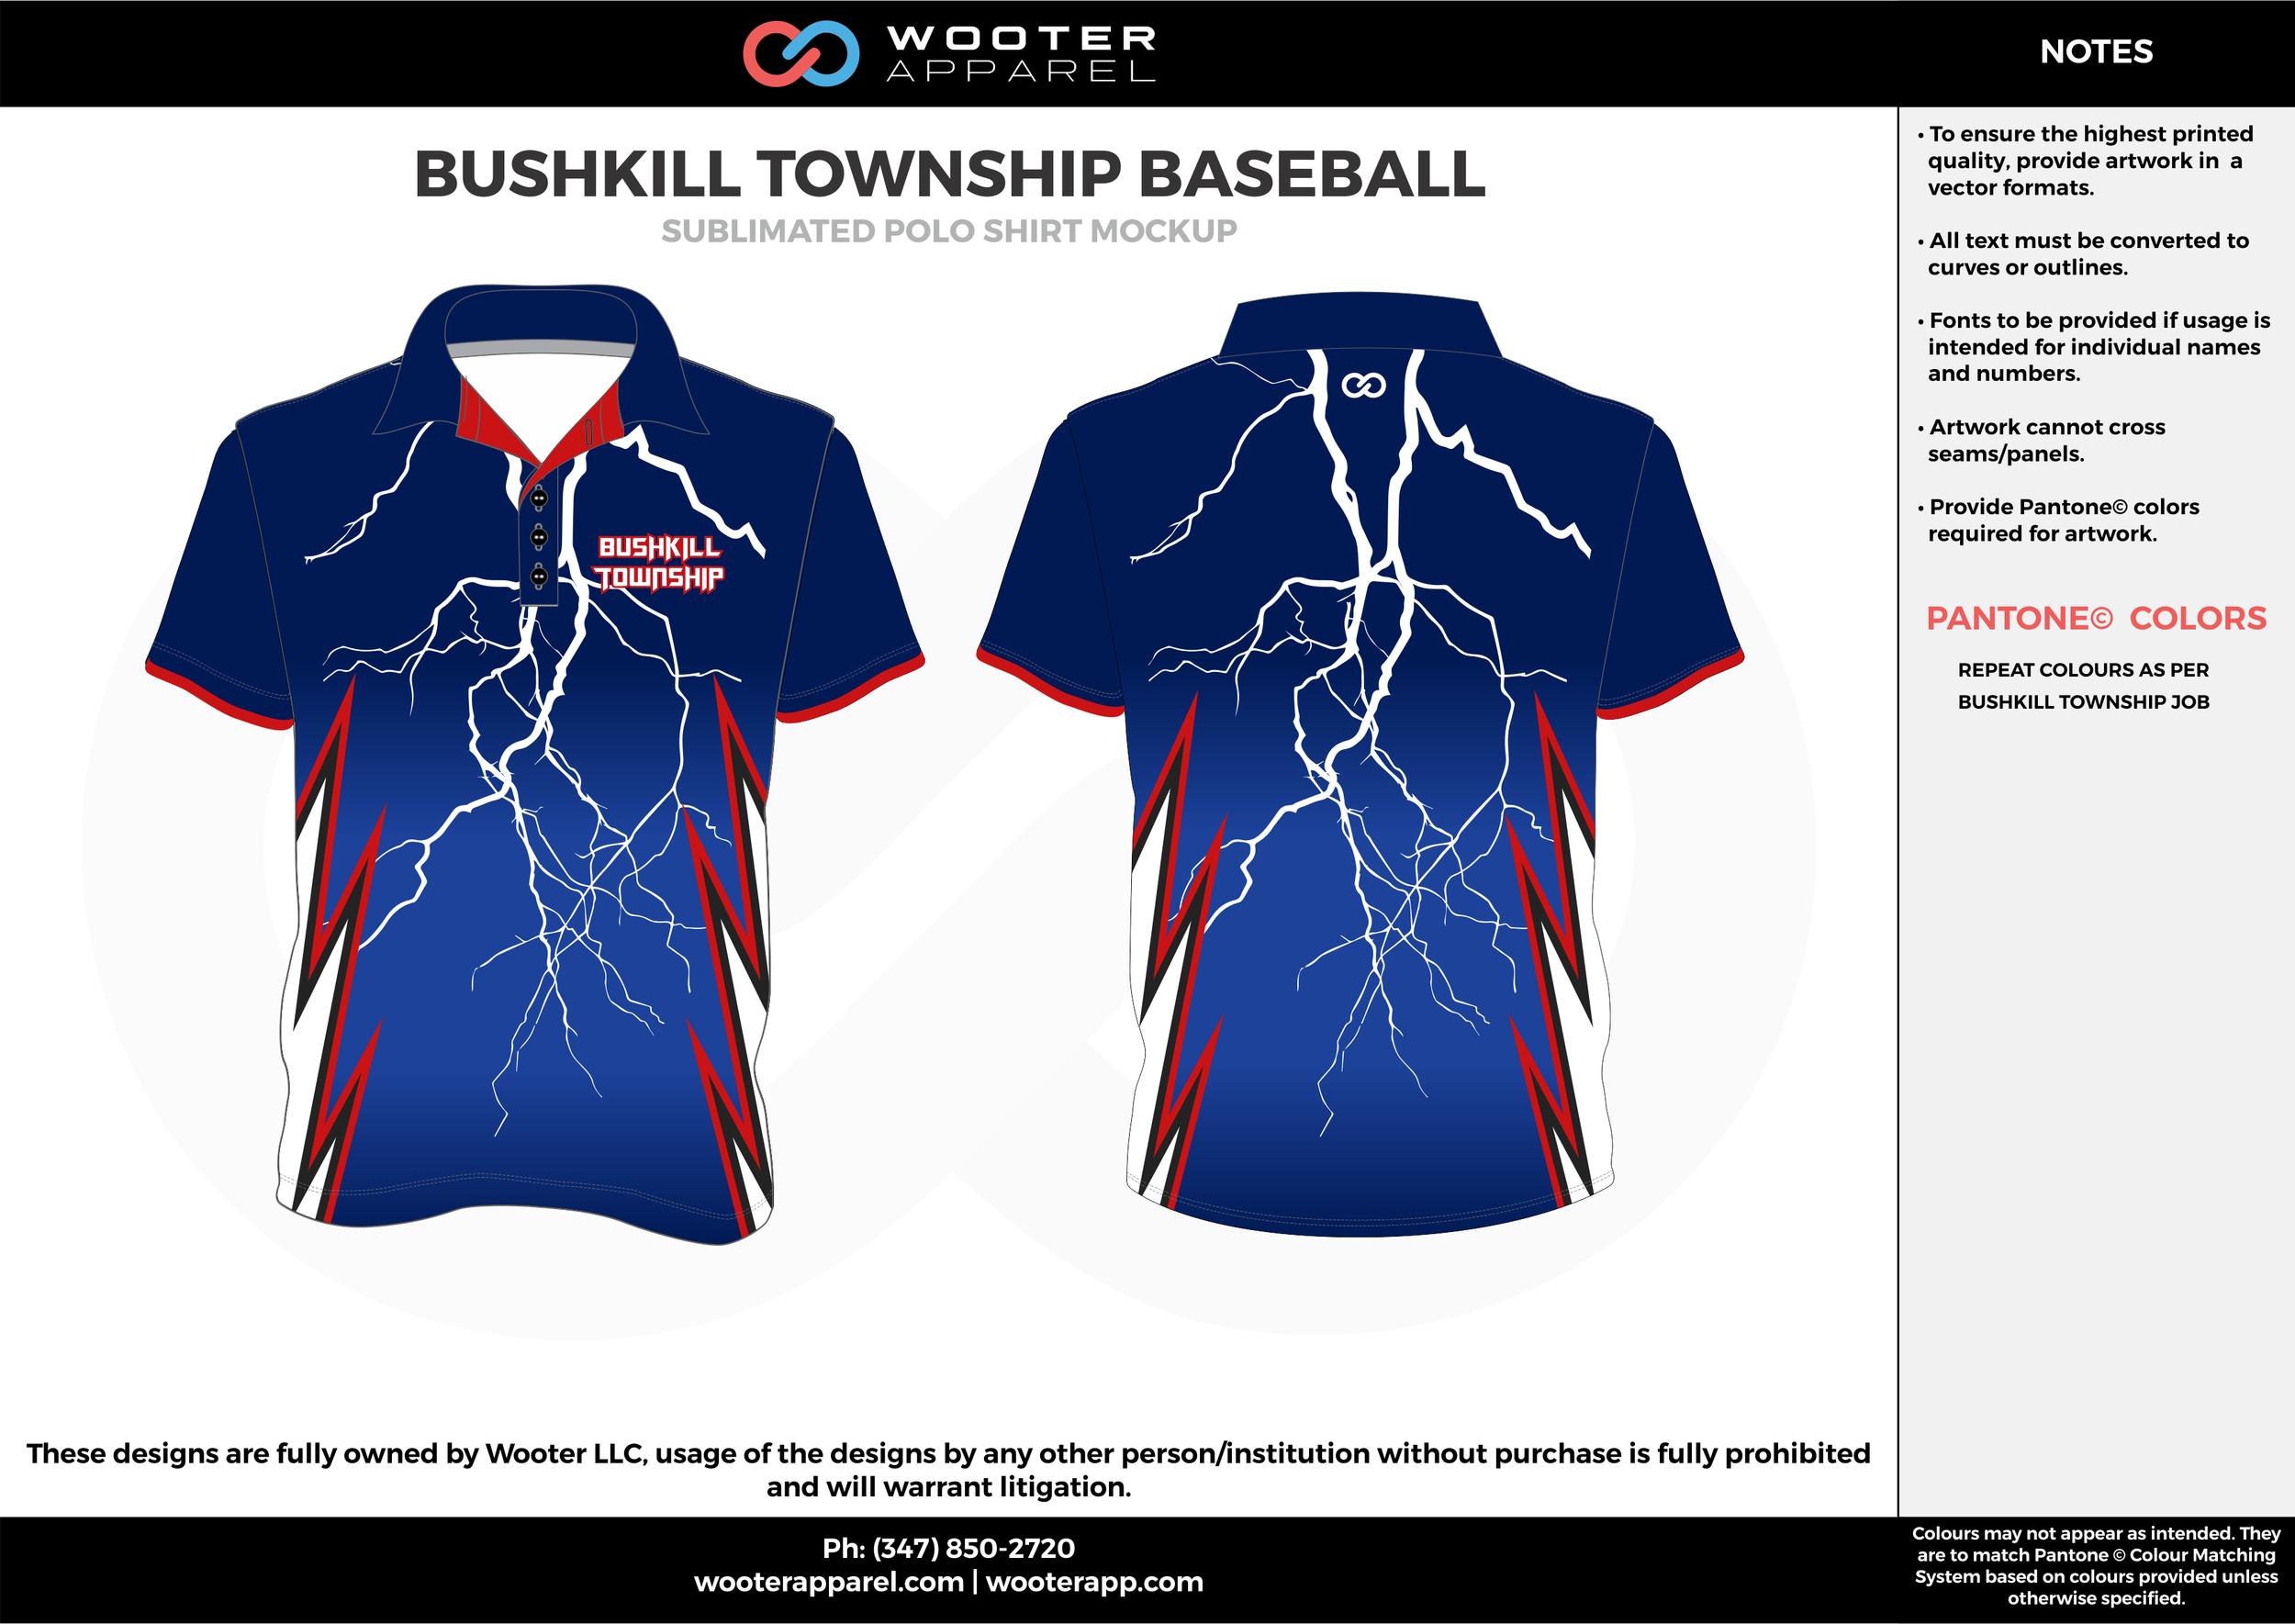 BUSHKILL TOWNSHIP BASEBALL blue red white Polo Shirts